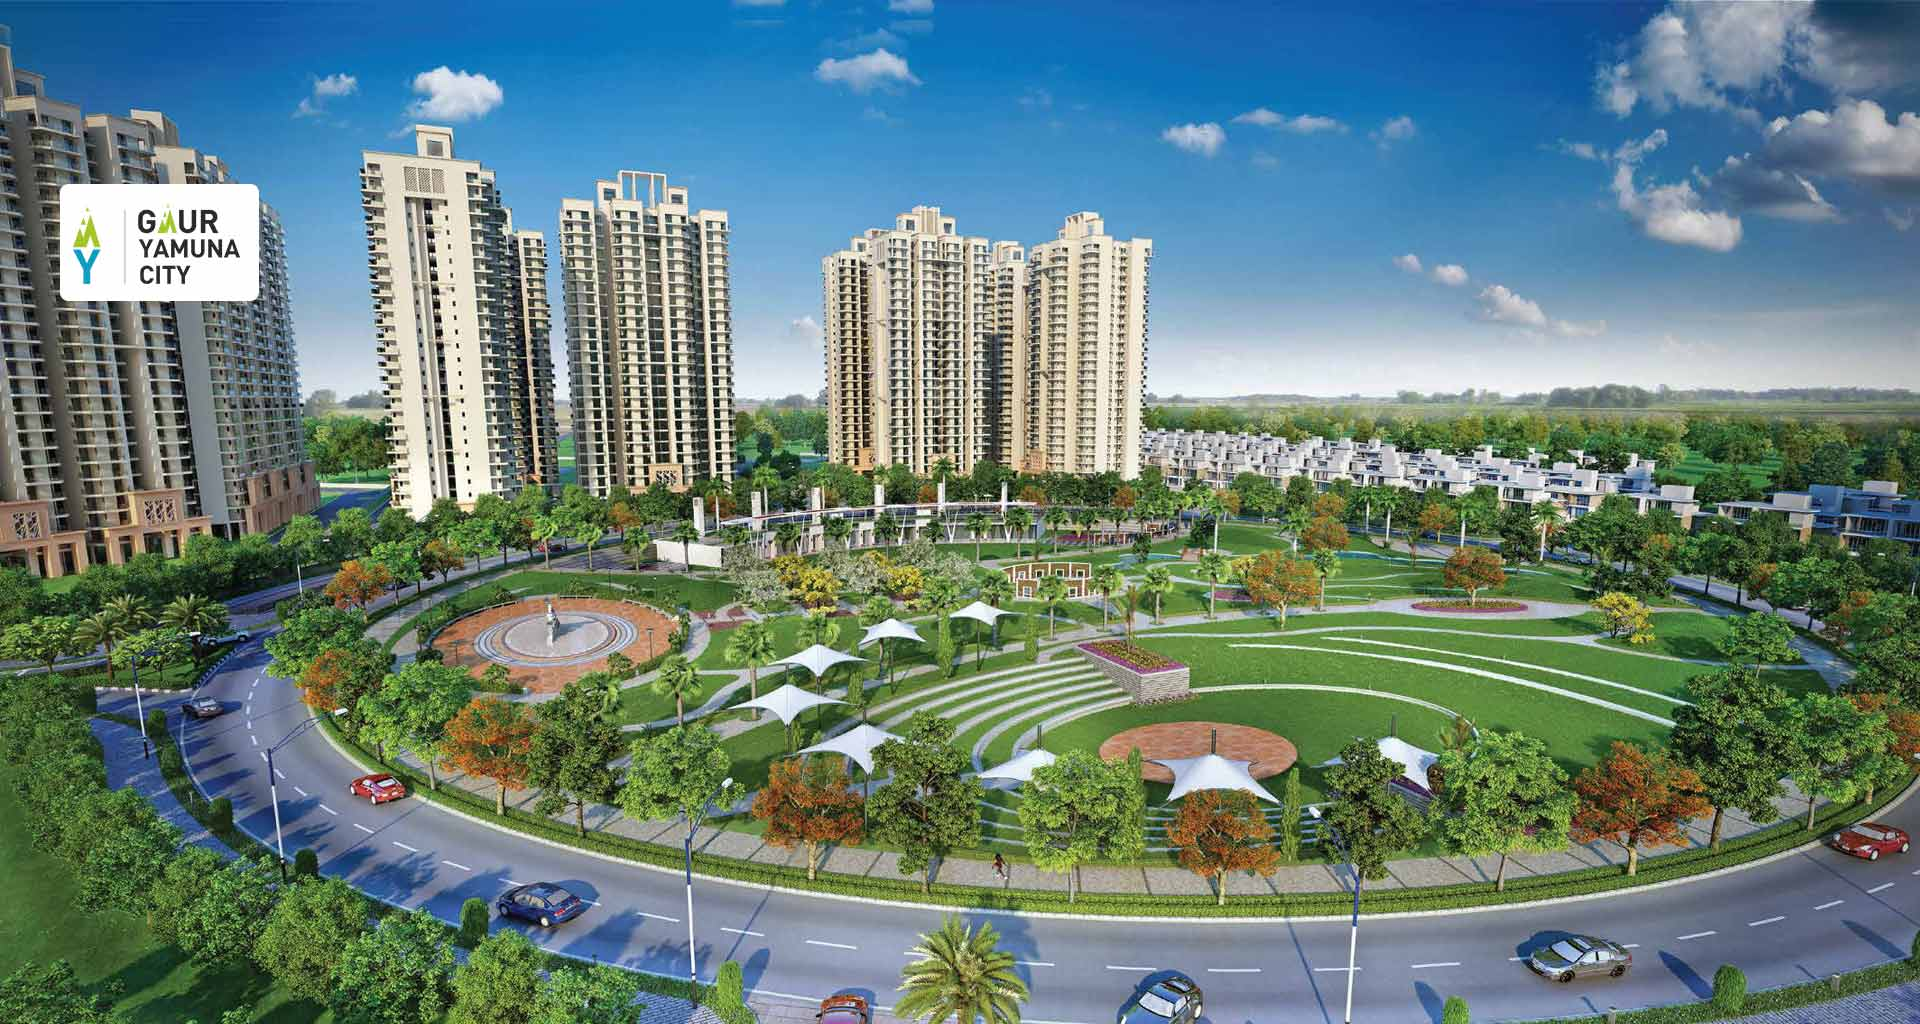 gaur yamuna-city-lake-view-villas